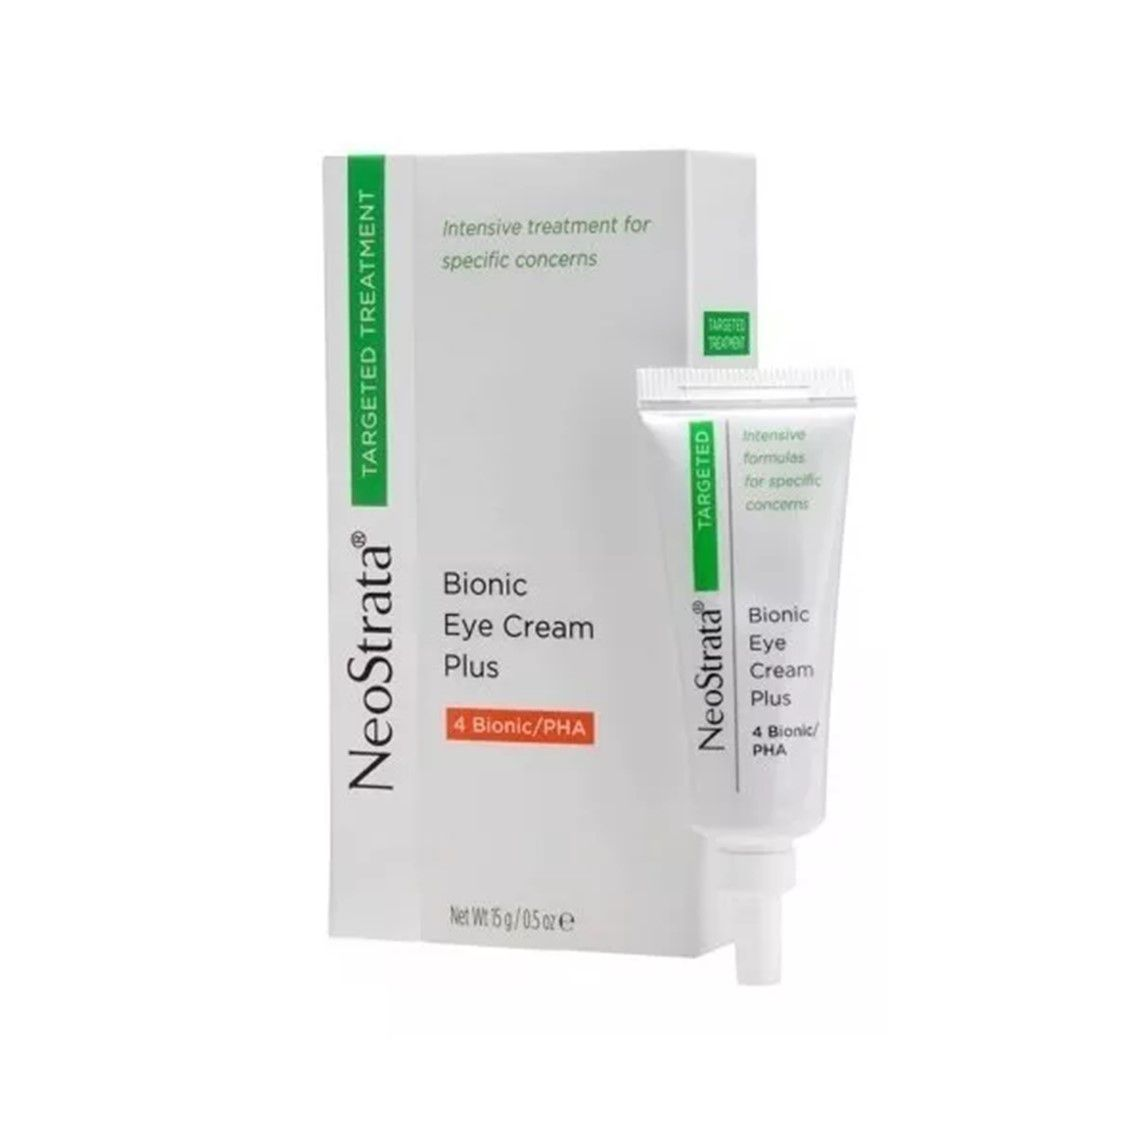 Neostrata Targeted Bionic Eye Cream Plus 15g